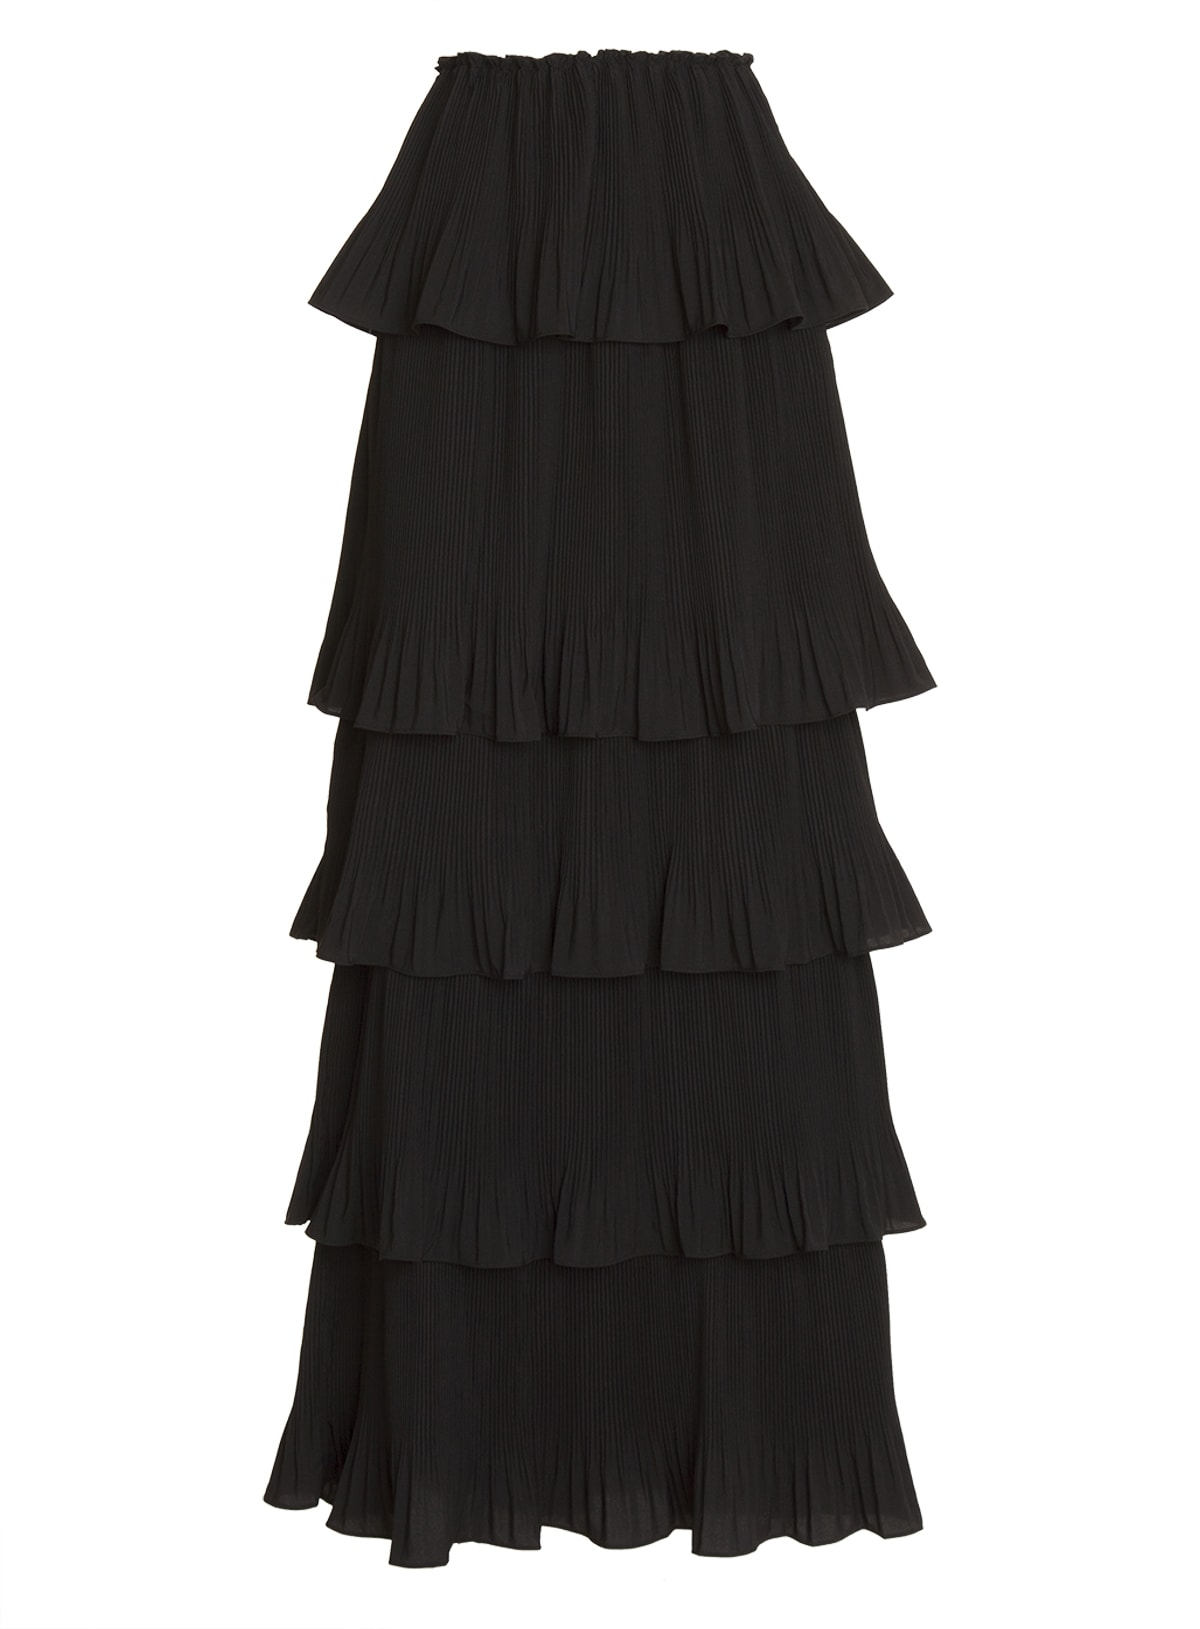 Buy Essentiel Antwerp Ruffled Dress online, shop Essentiel Antwerp with free shipping